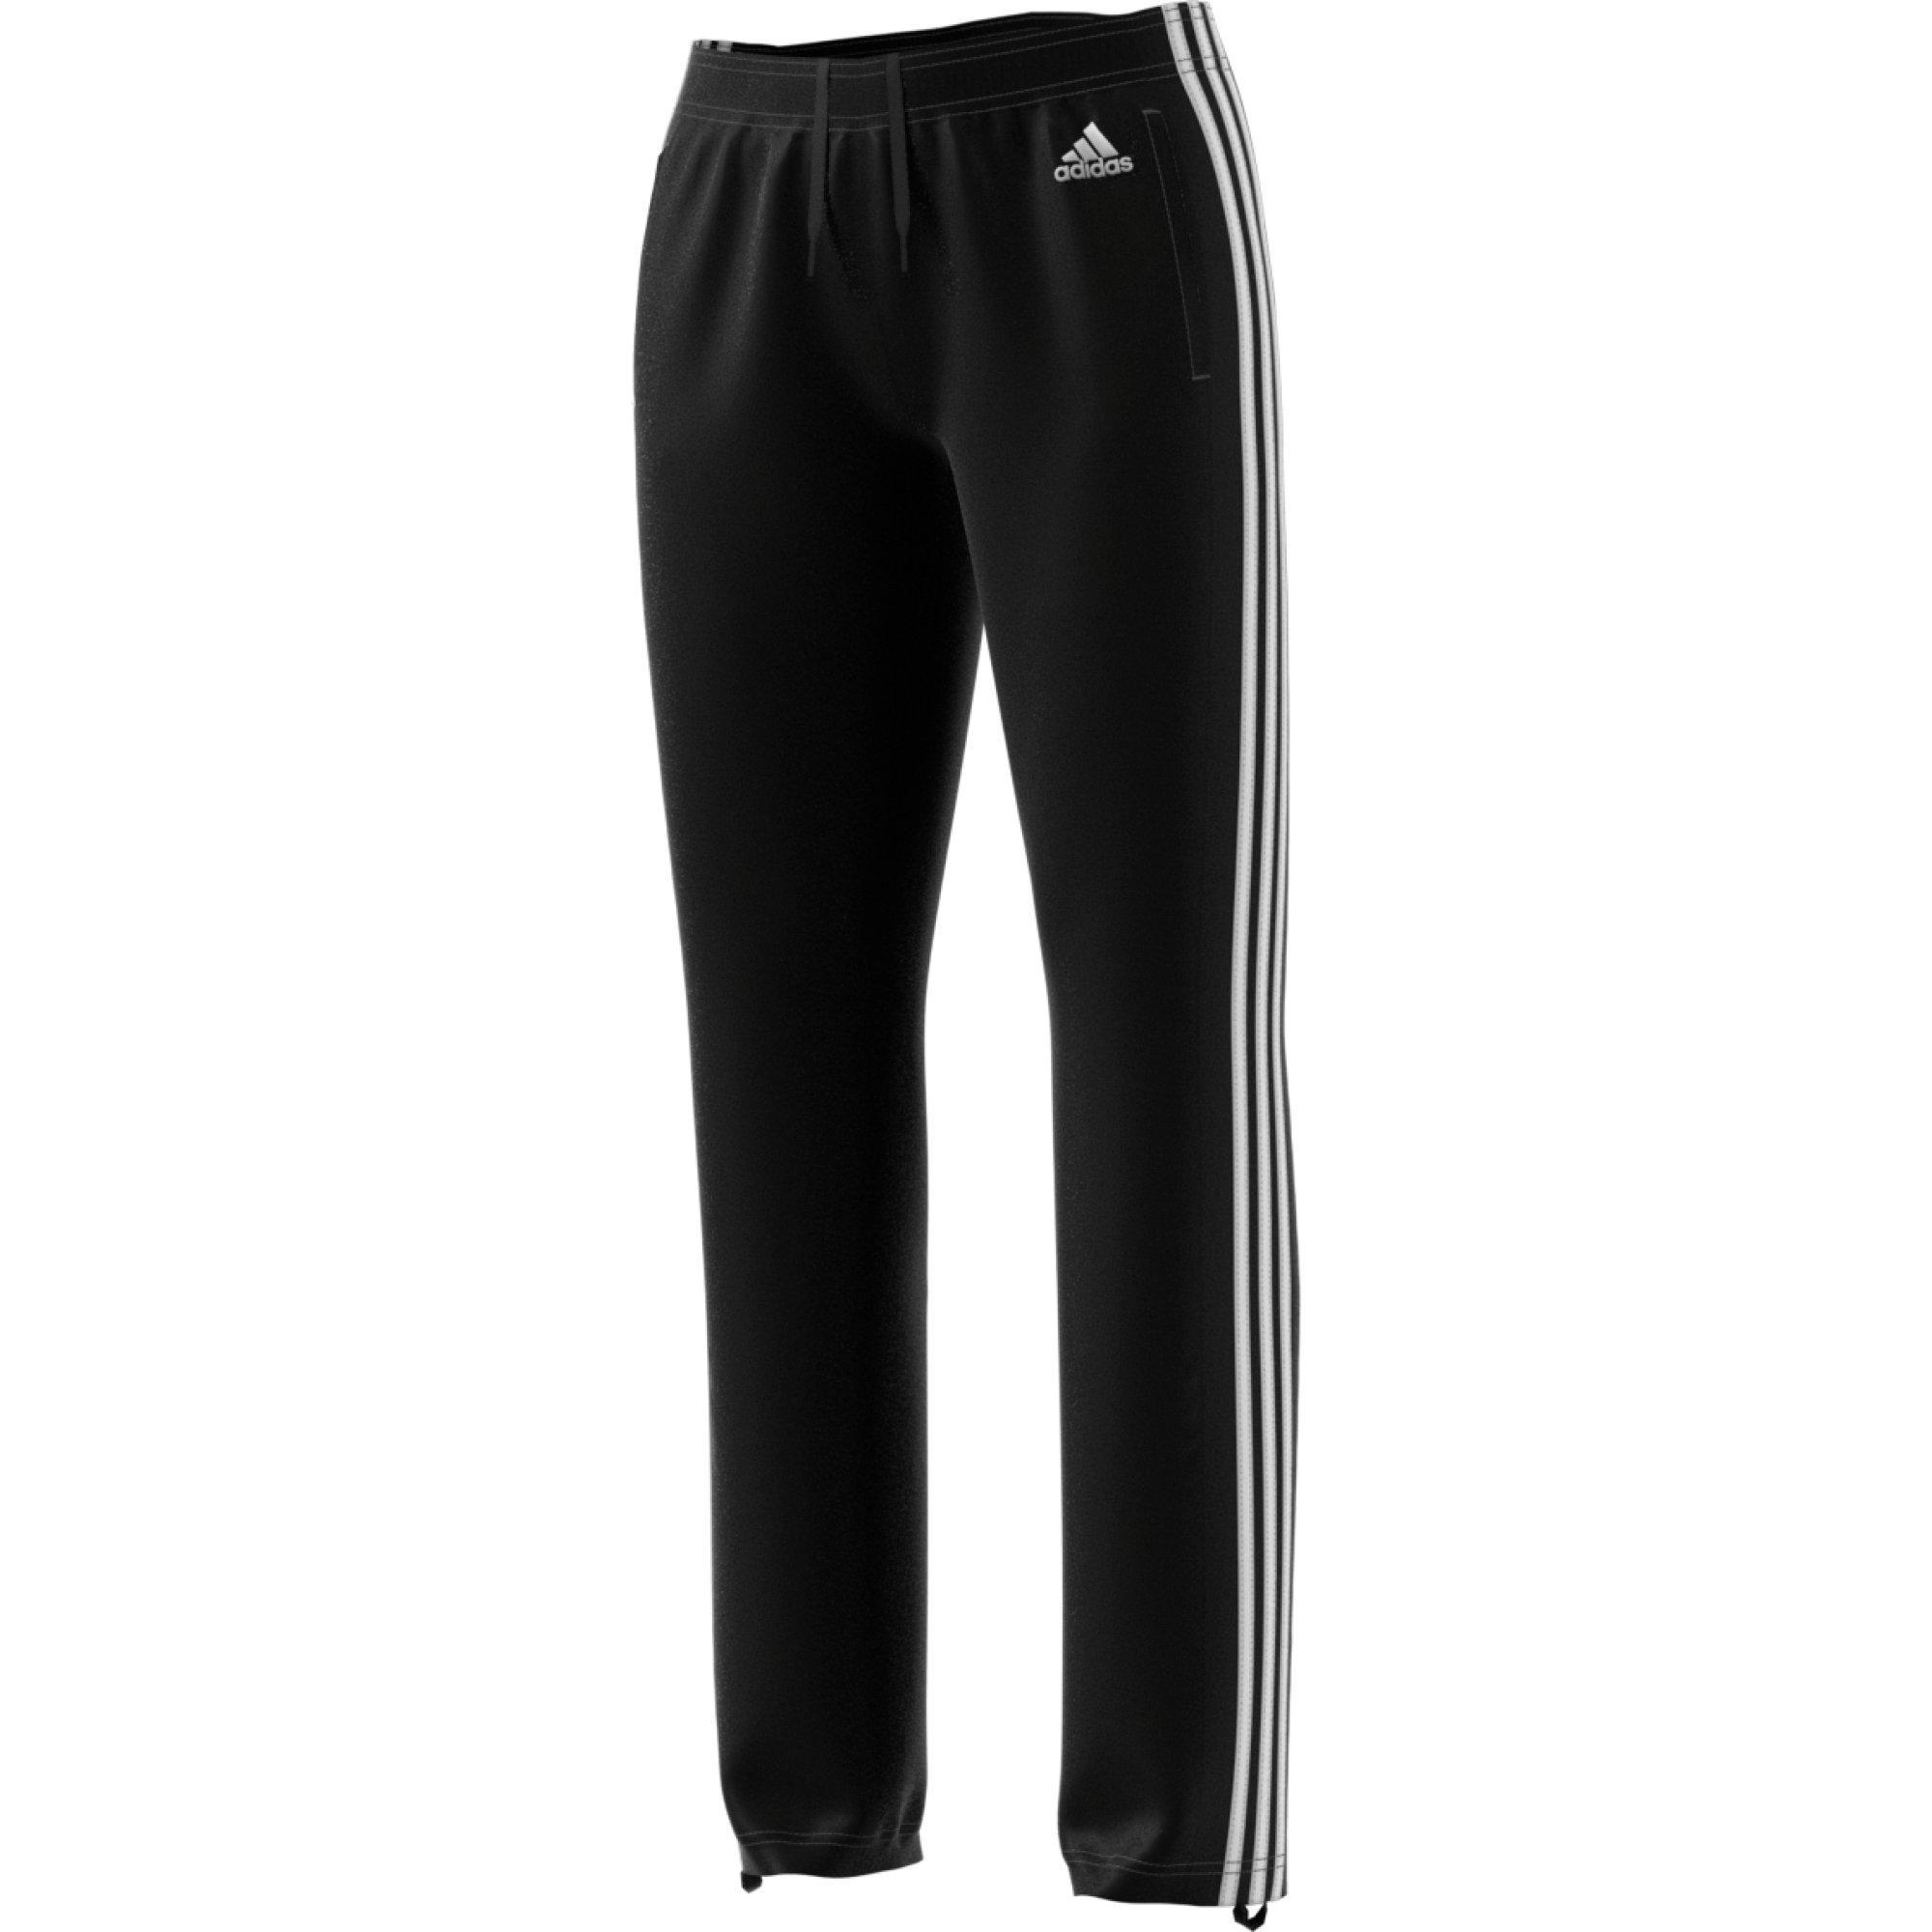 Select Styles.: (0). adidas Women\u0027s Designed 2 Move Straight Pant